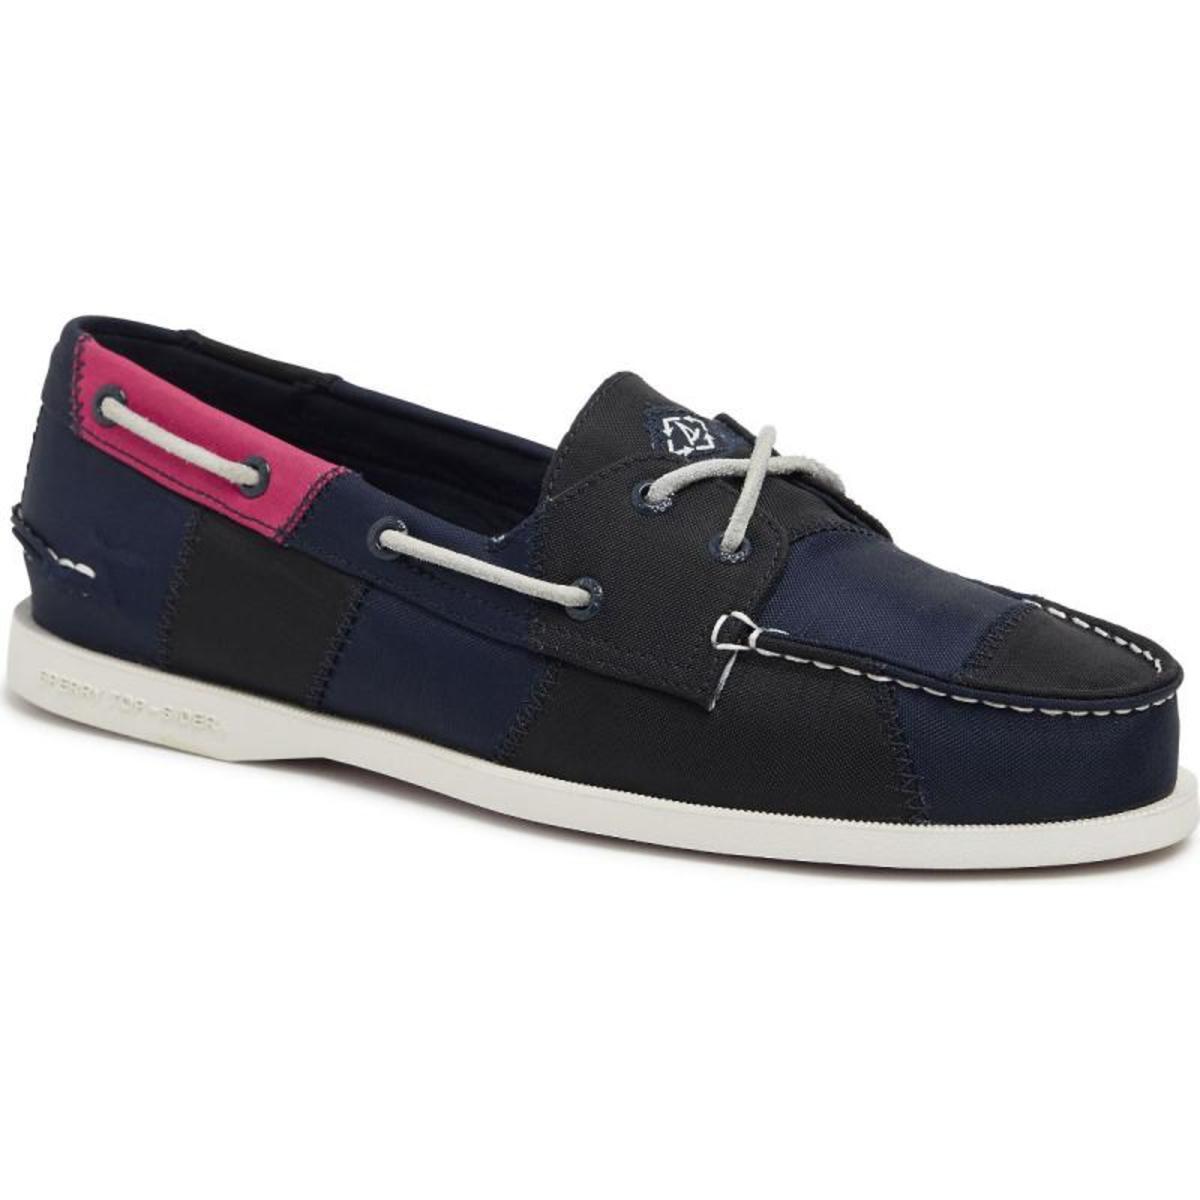 boat-shoes-womens-sperry-authentic-original-bionicc2ae-boat-shoe-blue-3